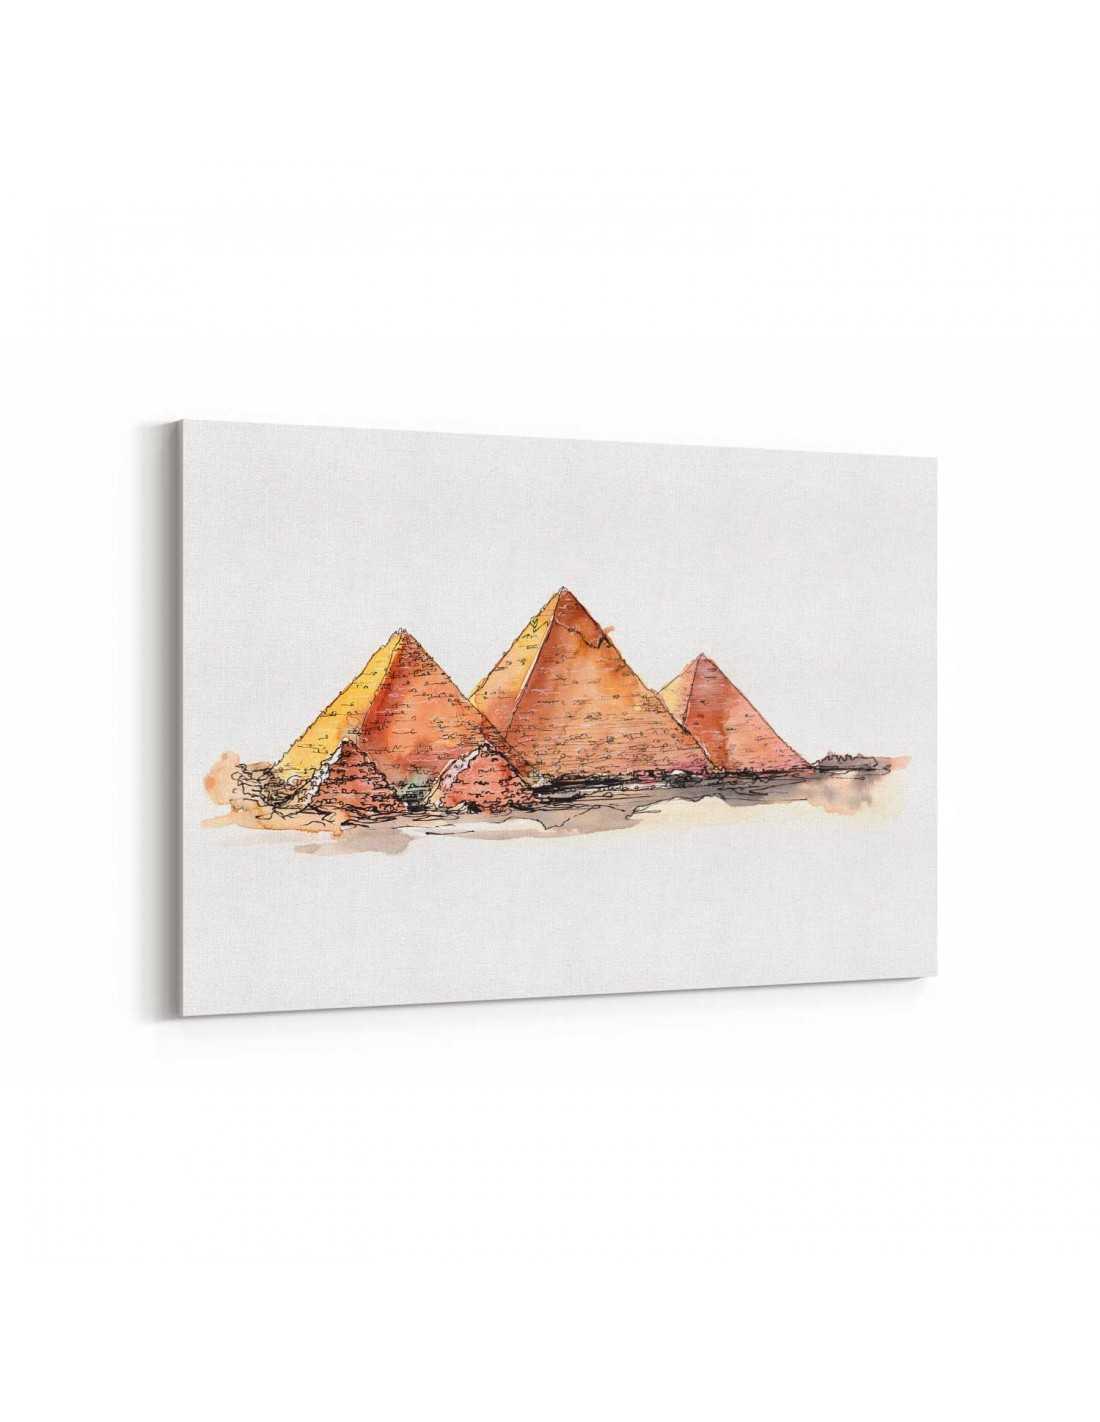 Misir Piramitler Cizim Kanvas Tablo